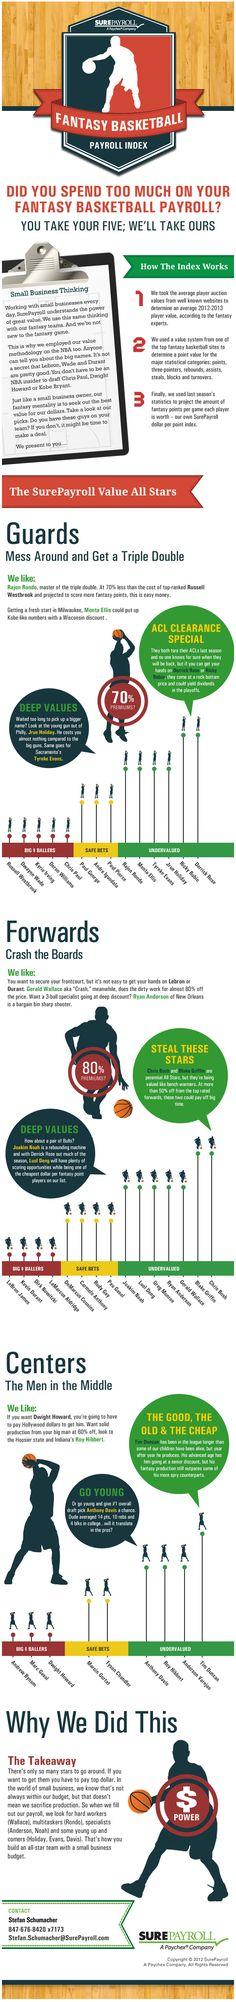 Fantasy Basketball Payroll Index - Infographic design